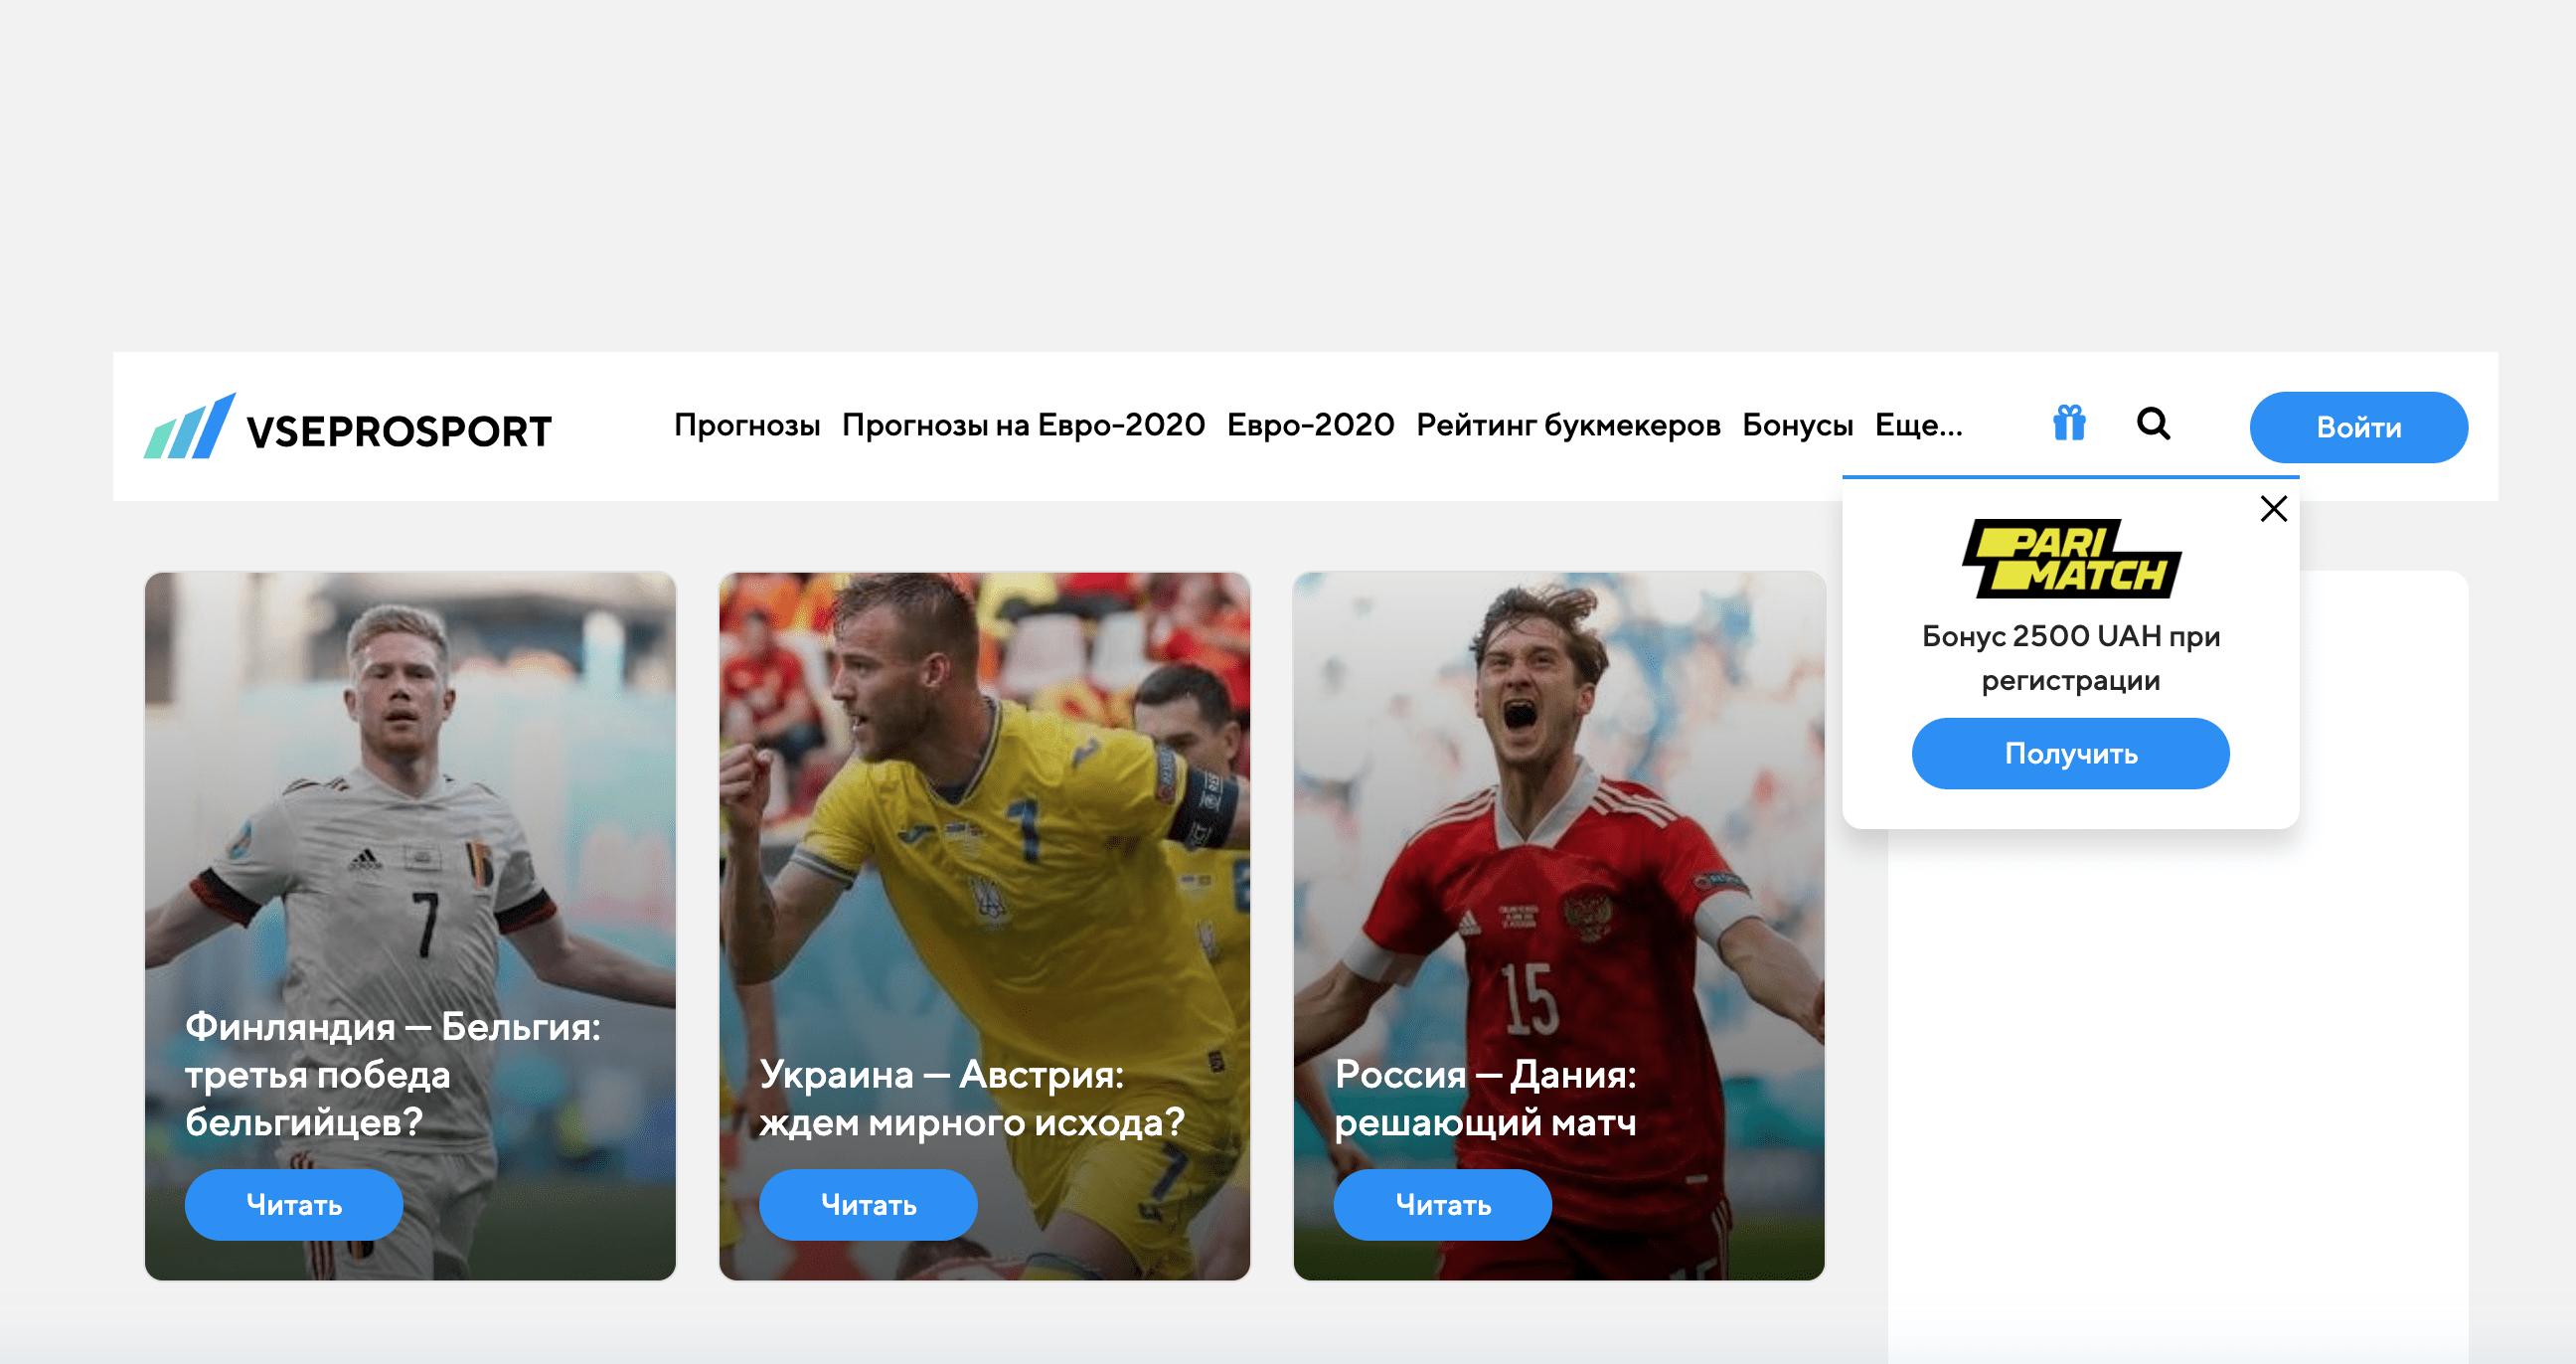 Главная страница сайта Vseprosport(Всепроспорт)